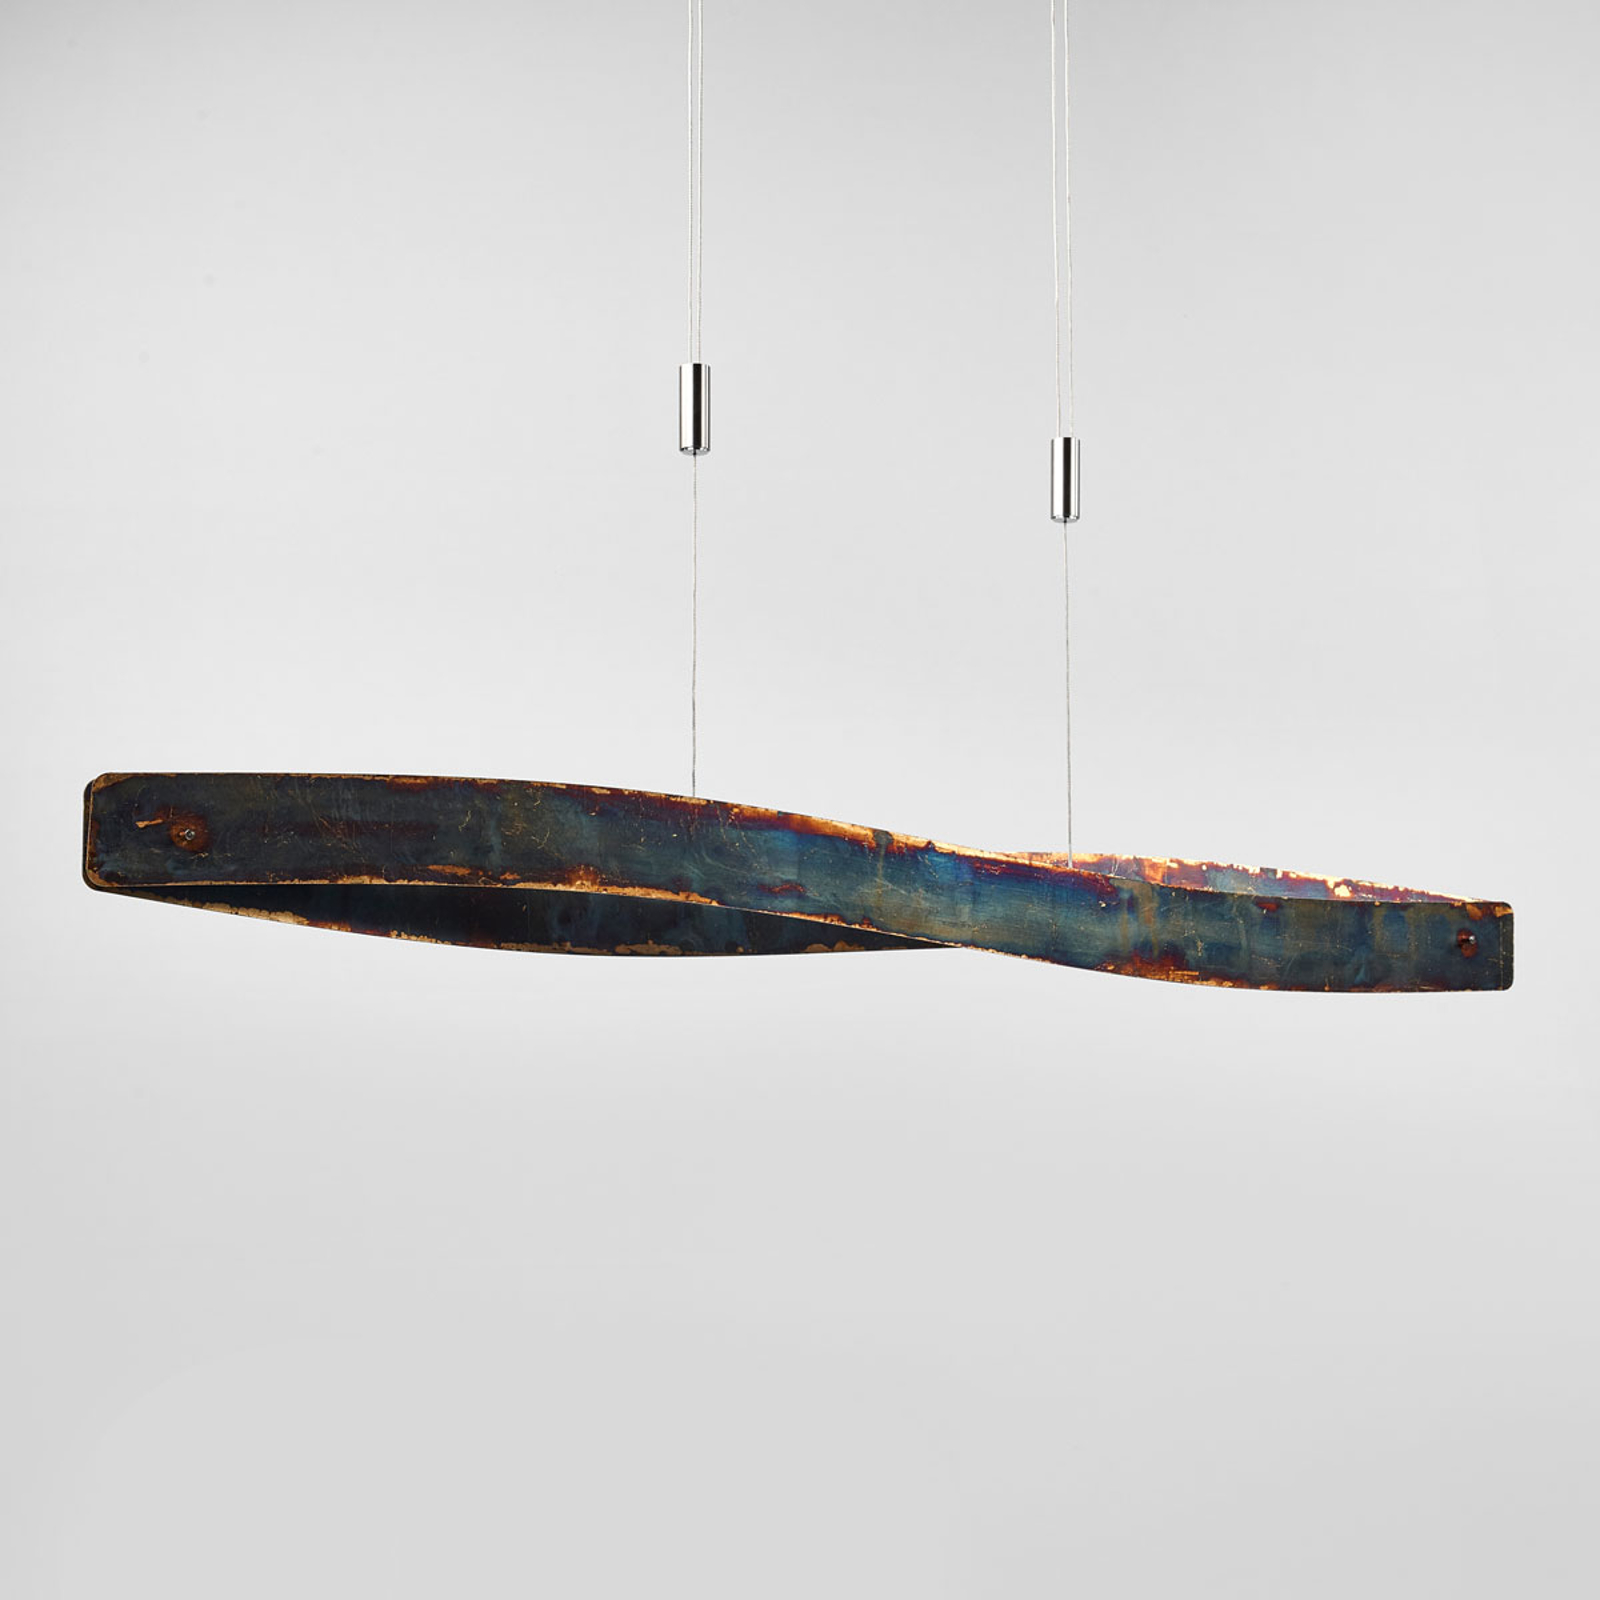 LED-Pendelleuchte Lian m. oxidierter Oberfläche